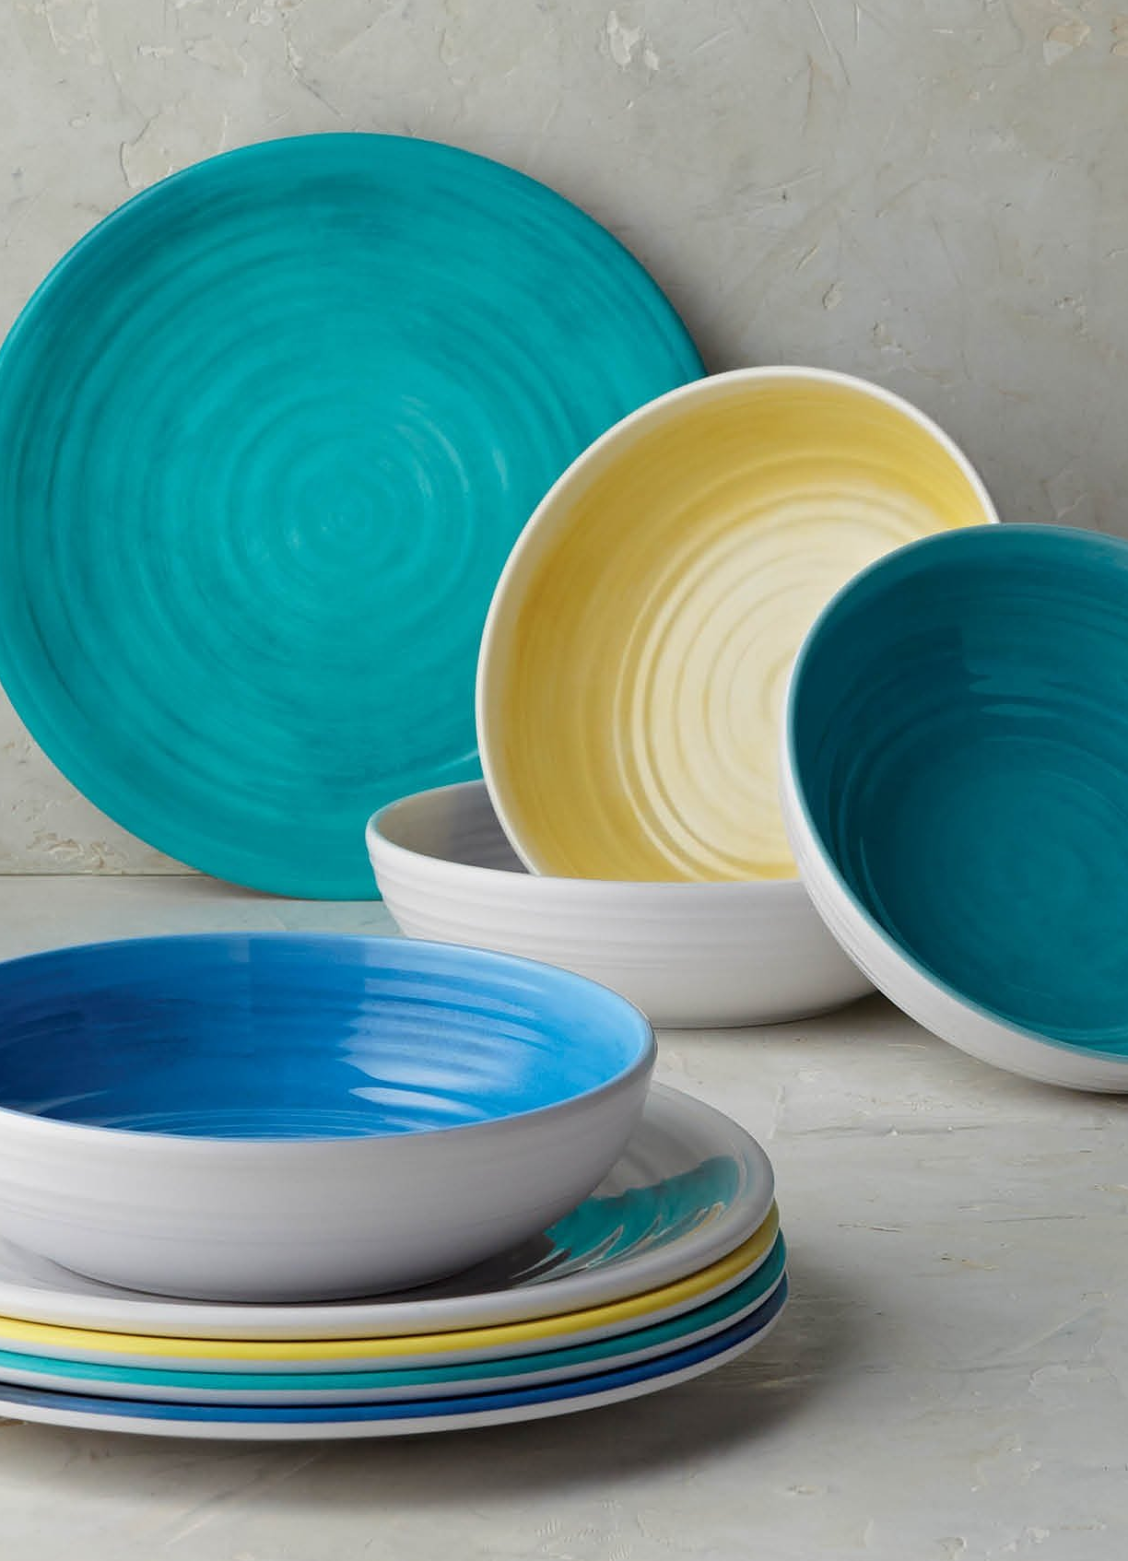 Alfresco Melamine Dinnerware Collection Frontgate Colorful Dinnerware Outdoor Dinnerware Colorful Dishware